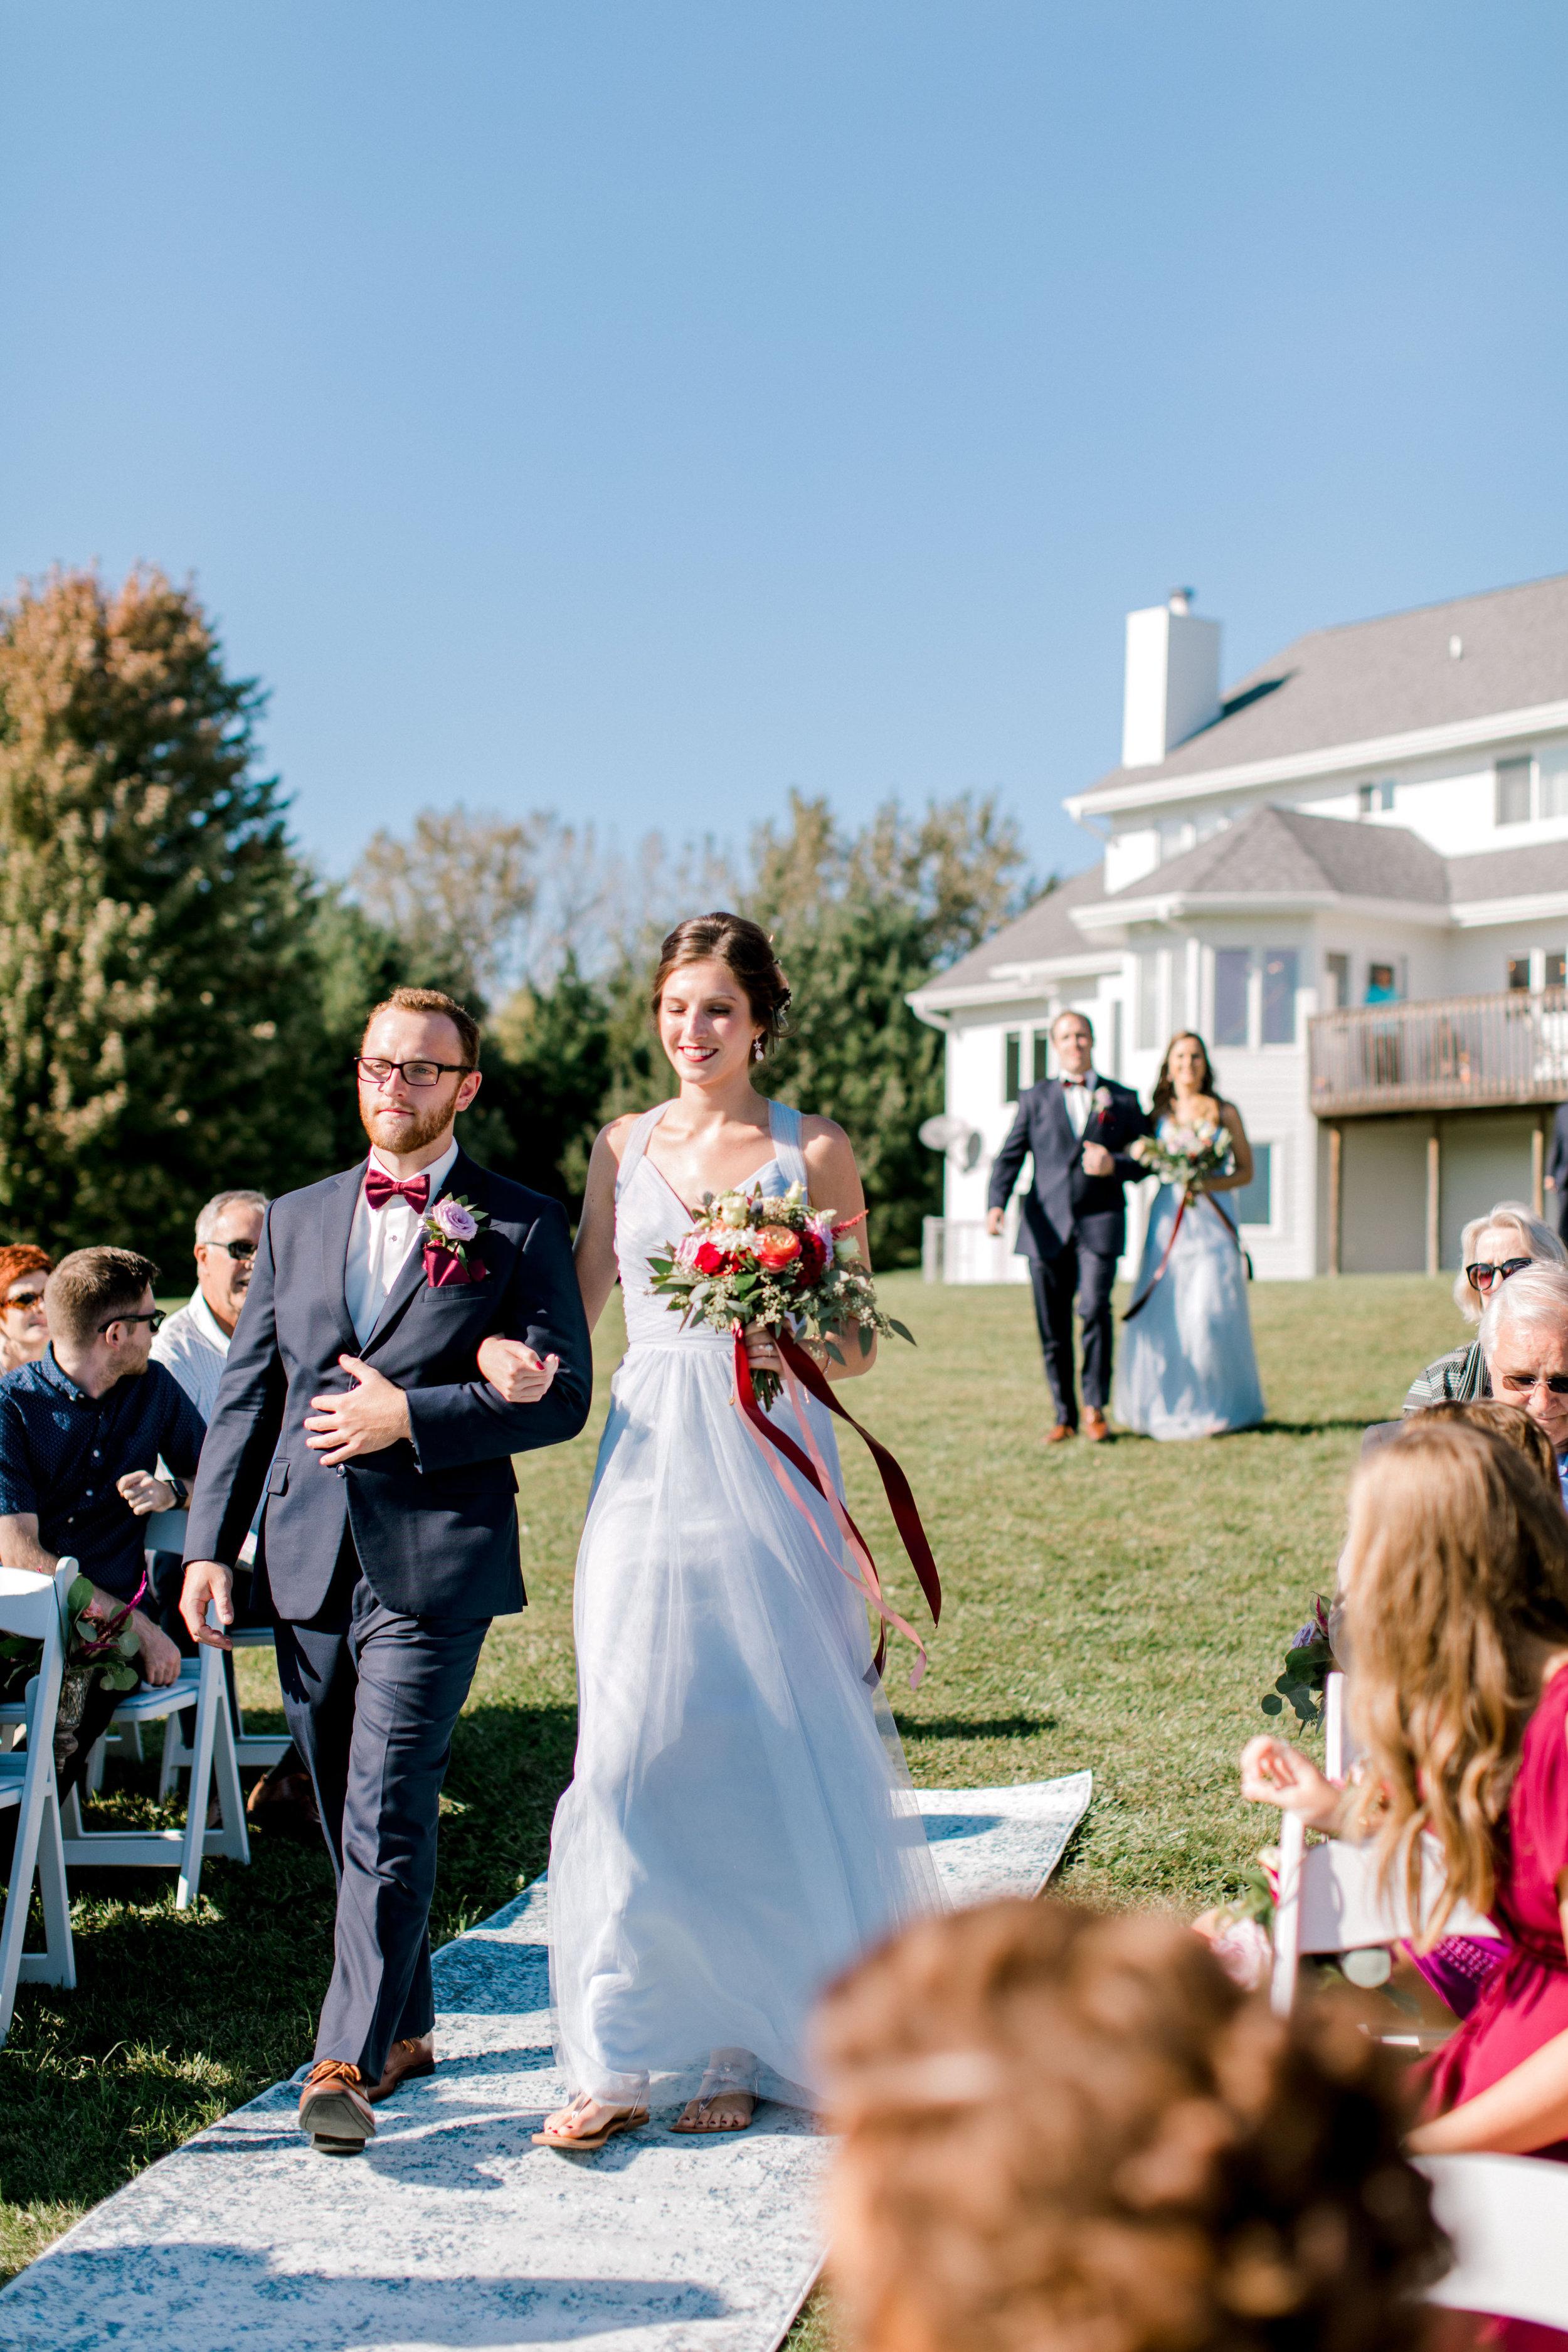 Ryan Alexa Married-Formals Ceremony-0124.jpg